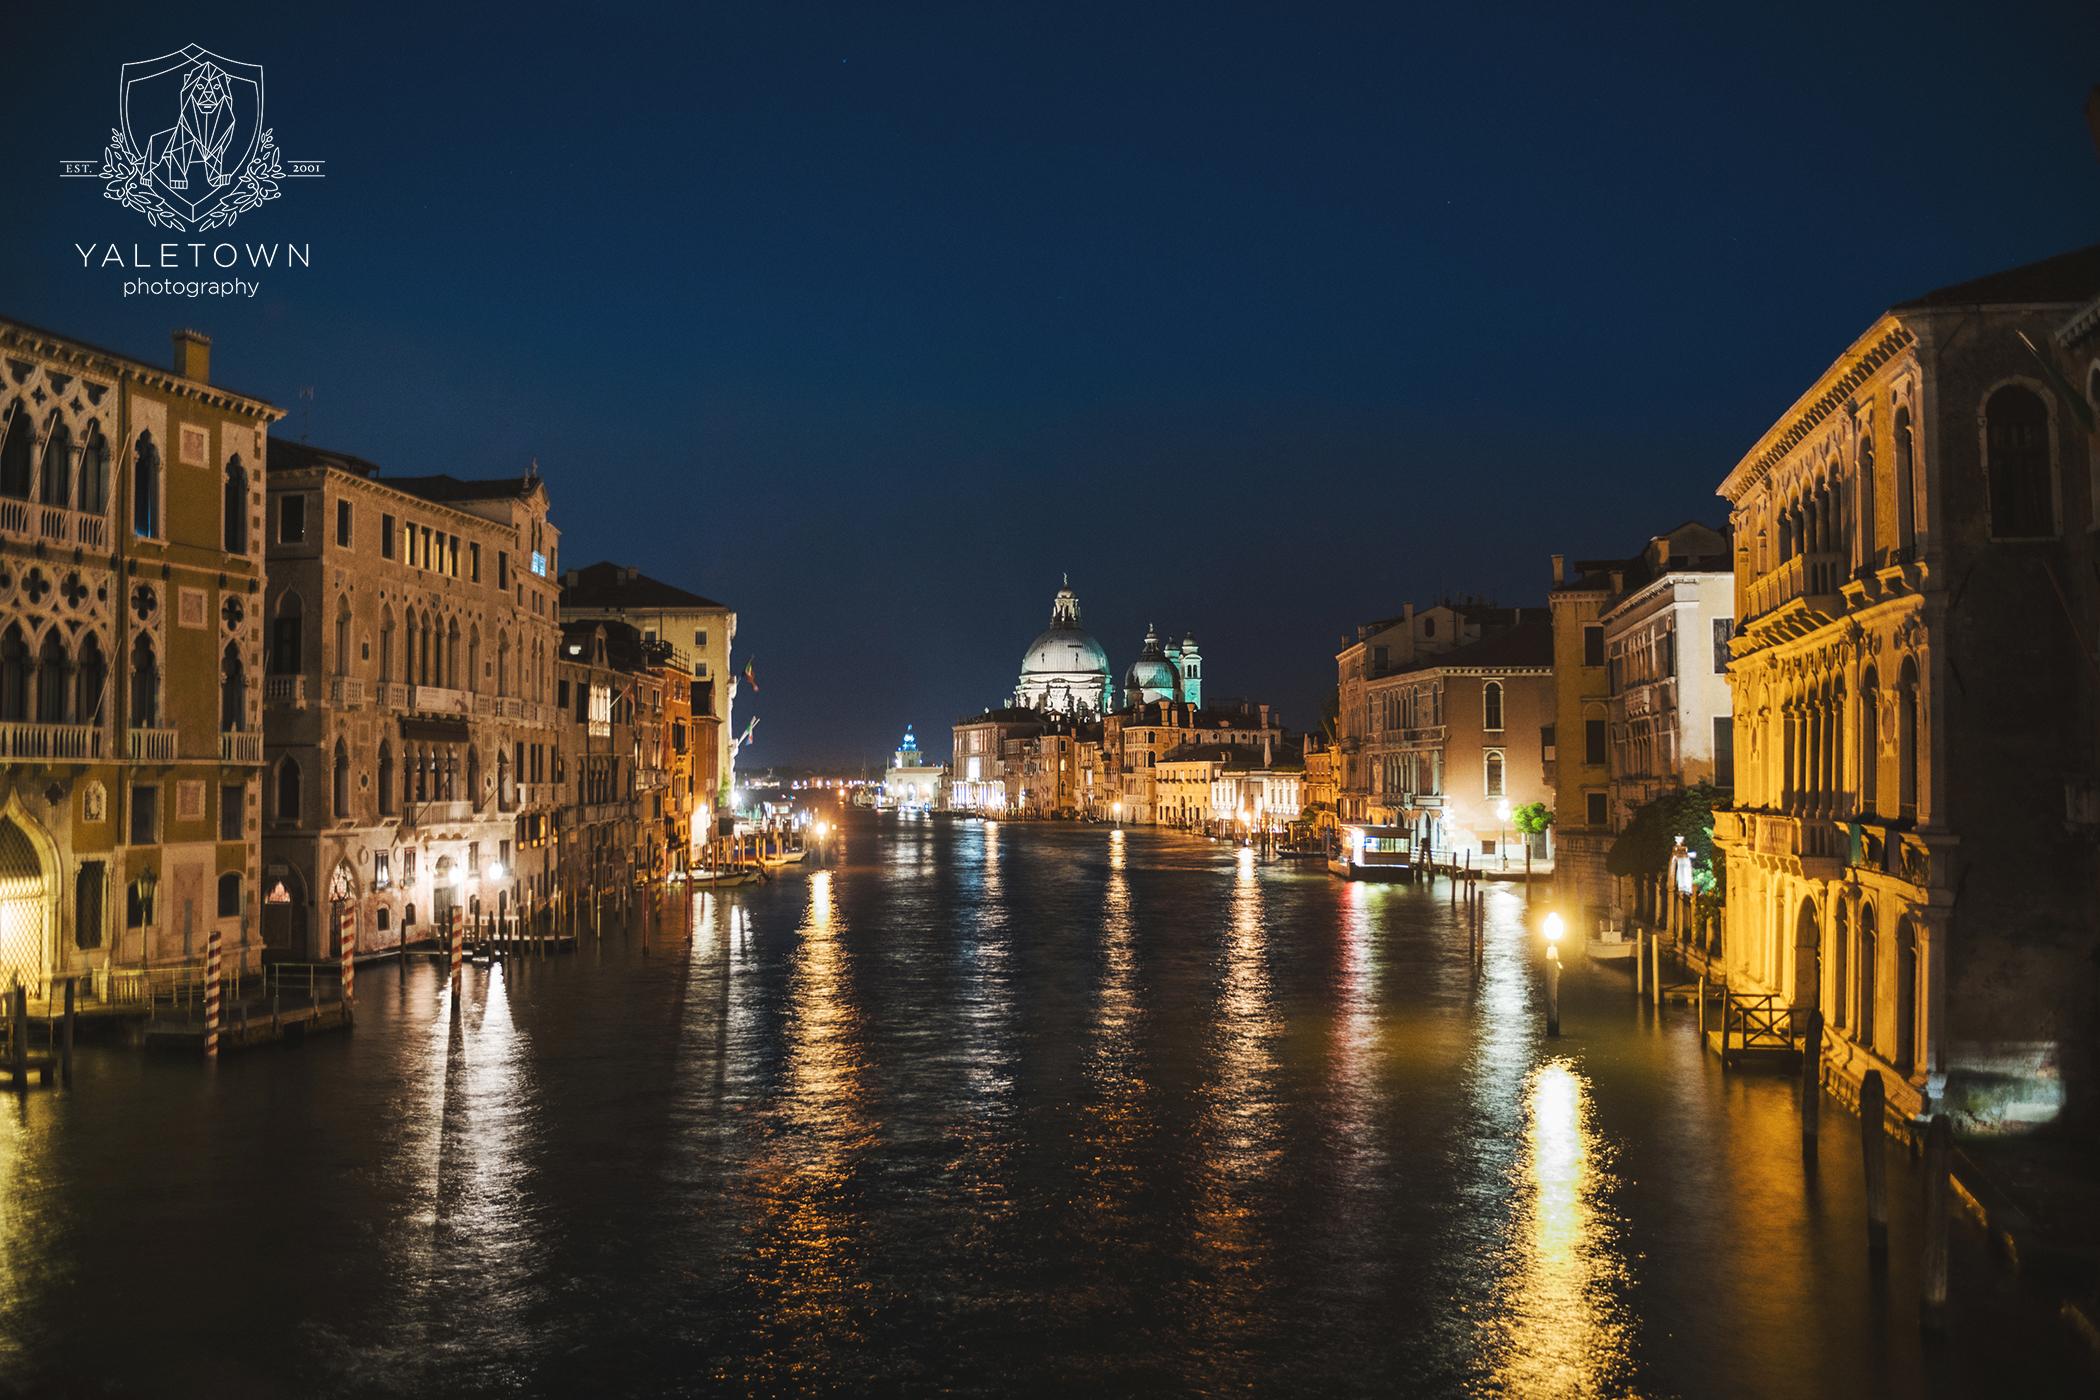 Venice-portrait-session-yaletown-photography-vacation-photographer-photo-029.jpg